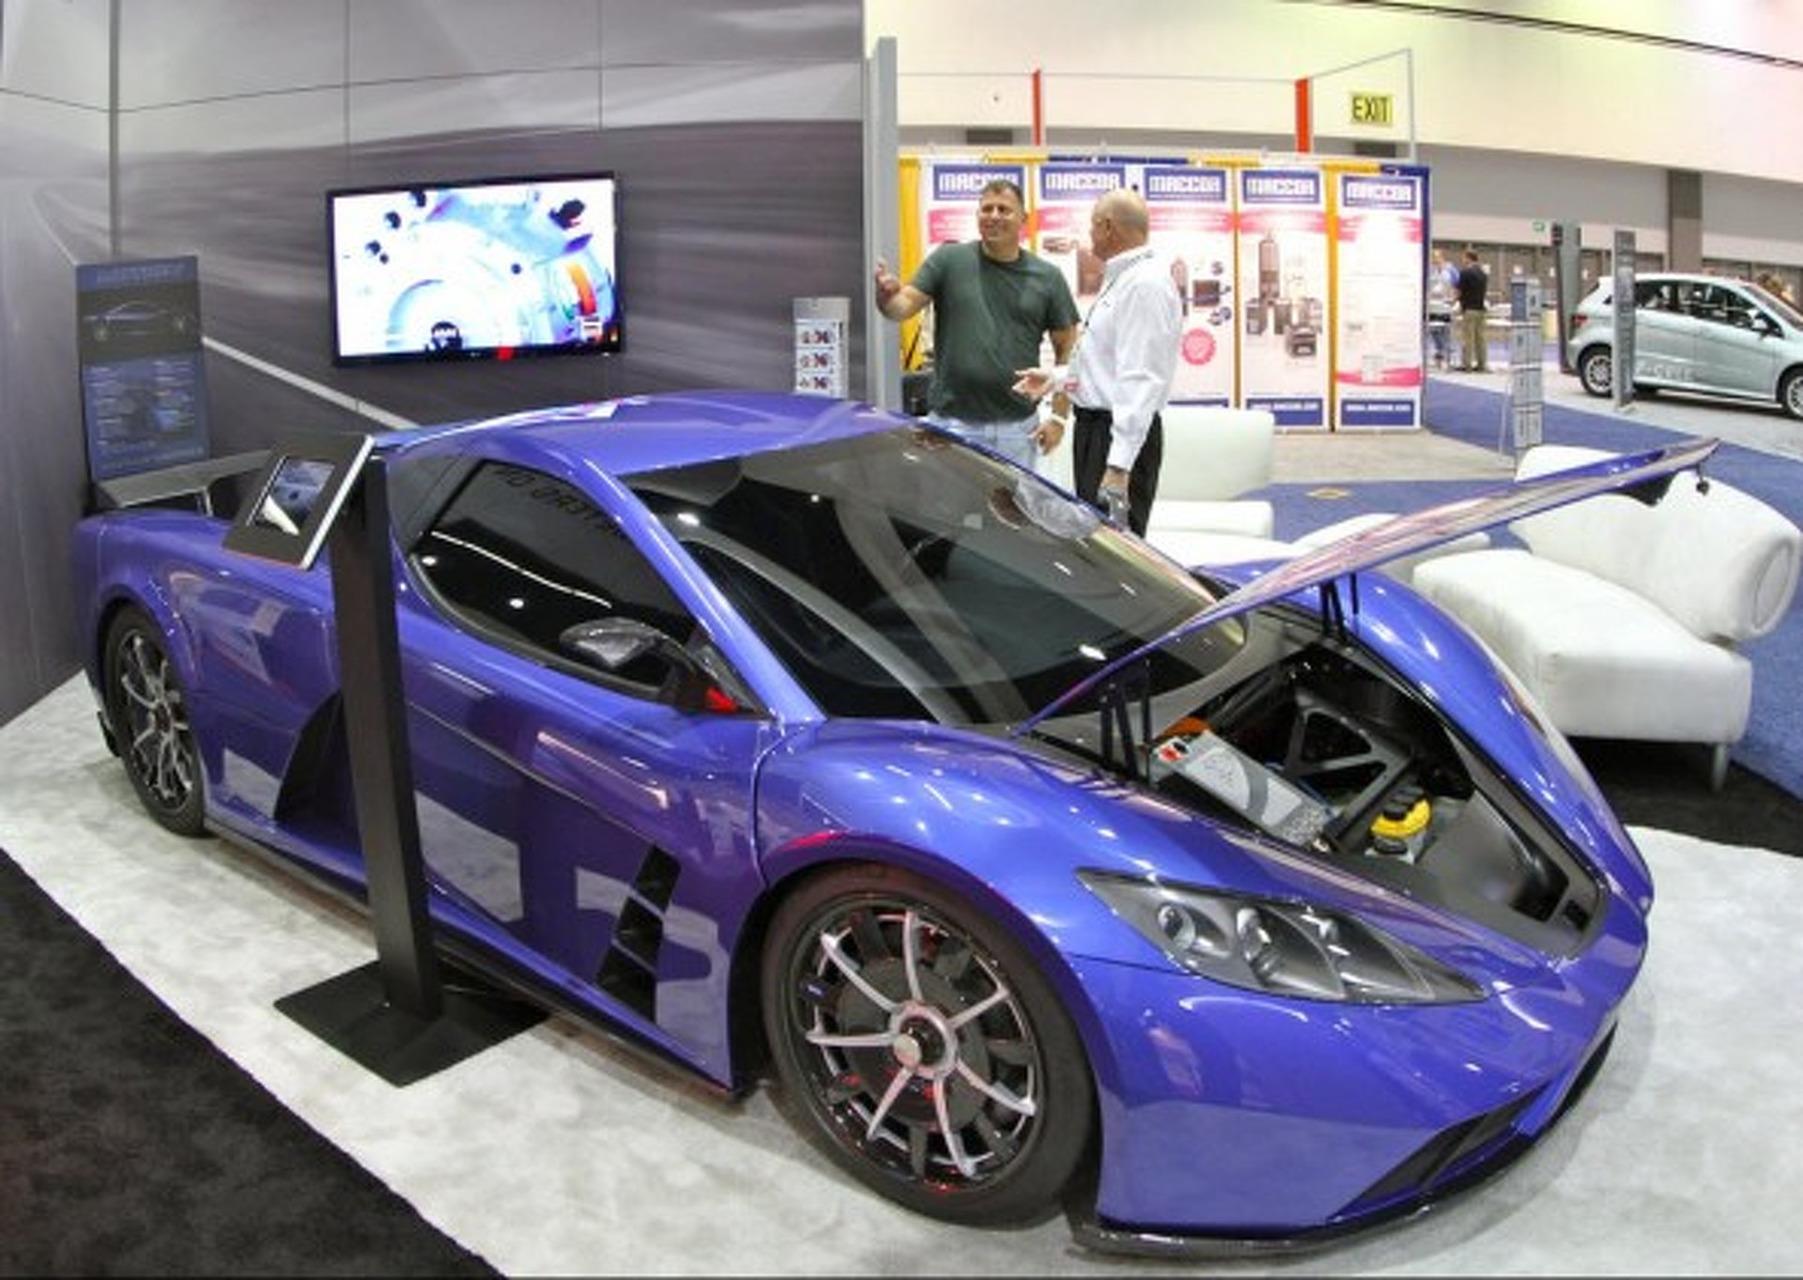 2012 Kepler Motion: 800 Hybrid HP, Carbon Fiber Sex Machine